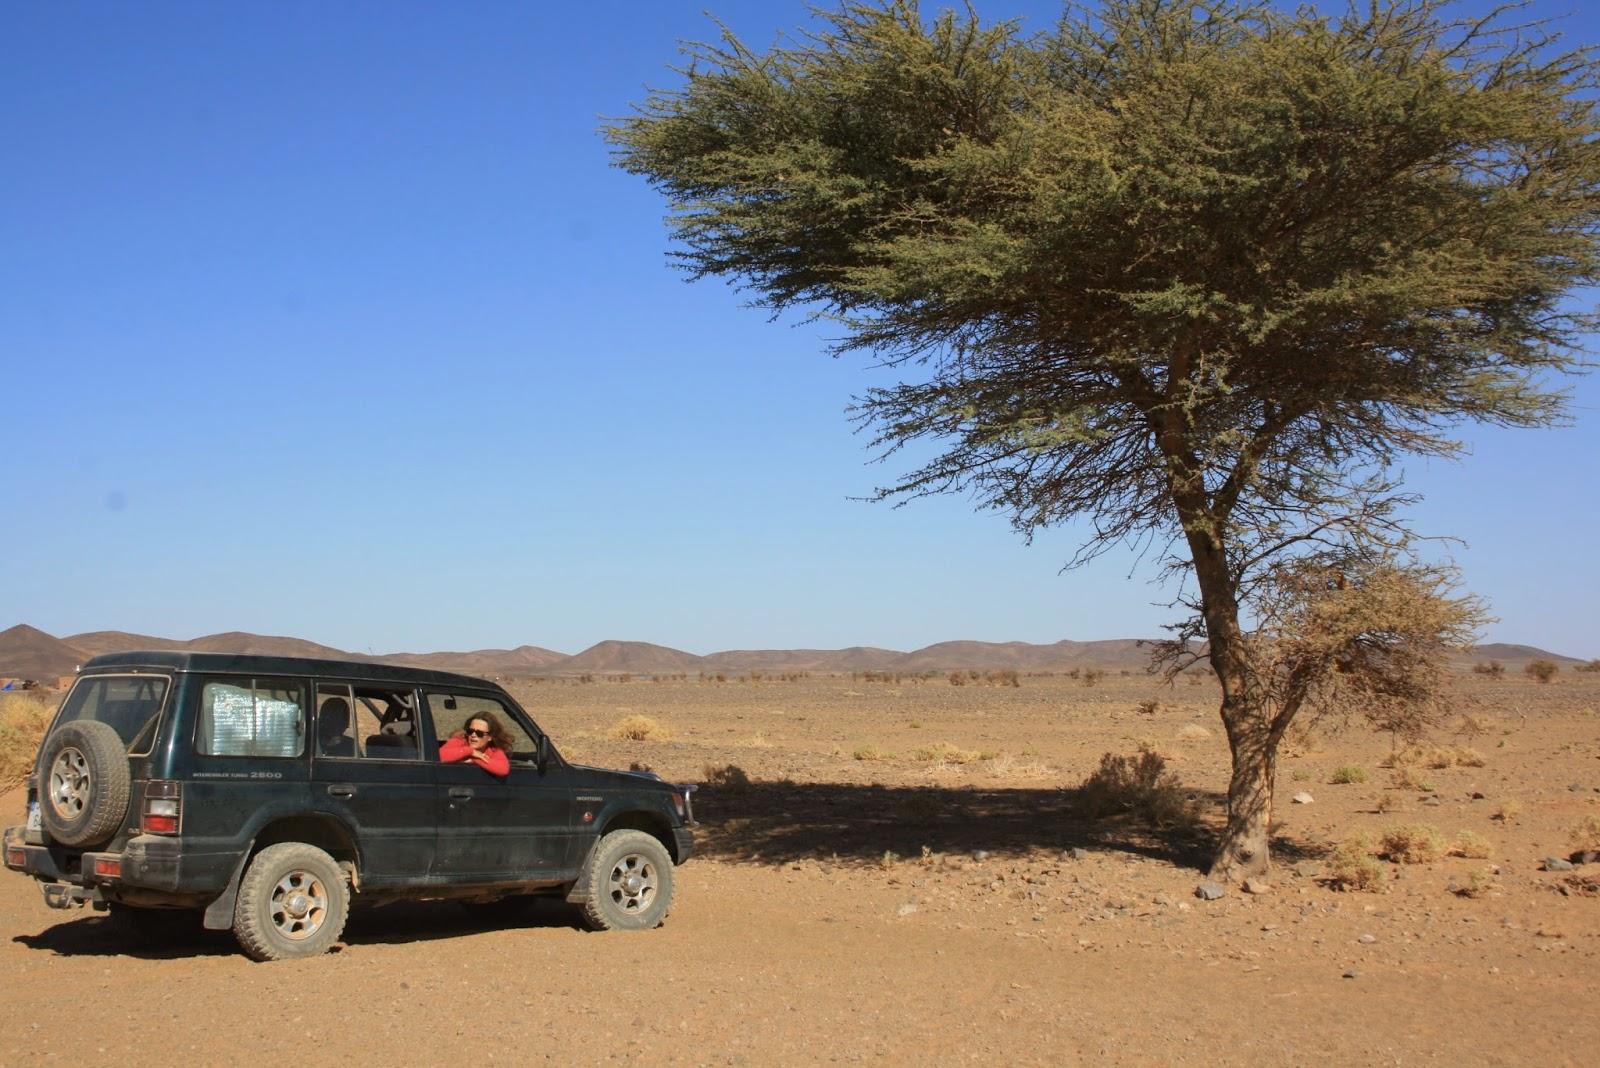 viajes a marruecos, alojamiento en erfoud, merzouga, dunas de erg chebi, desierto de marruecos